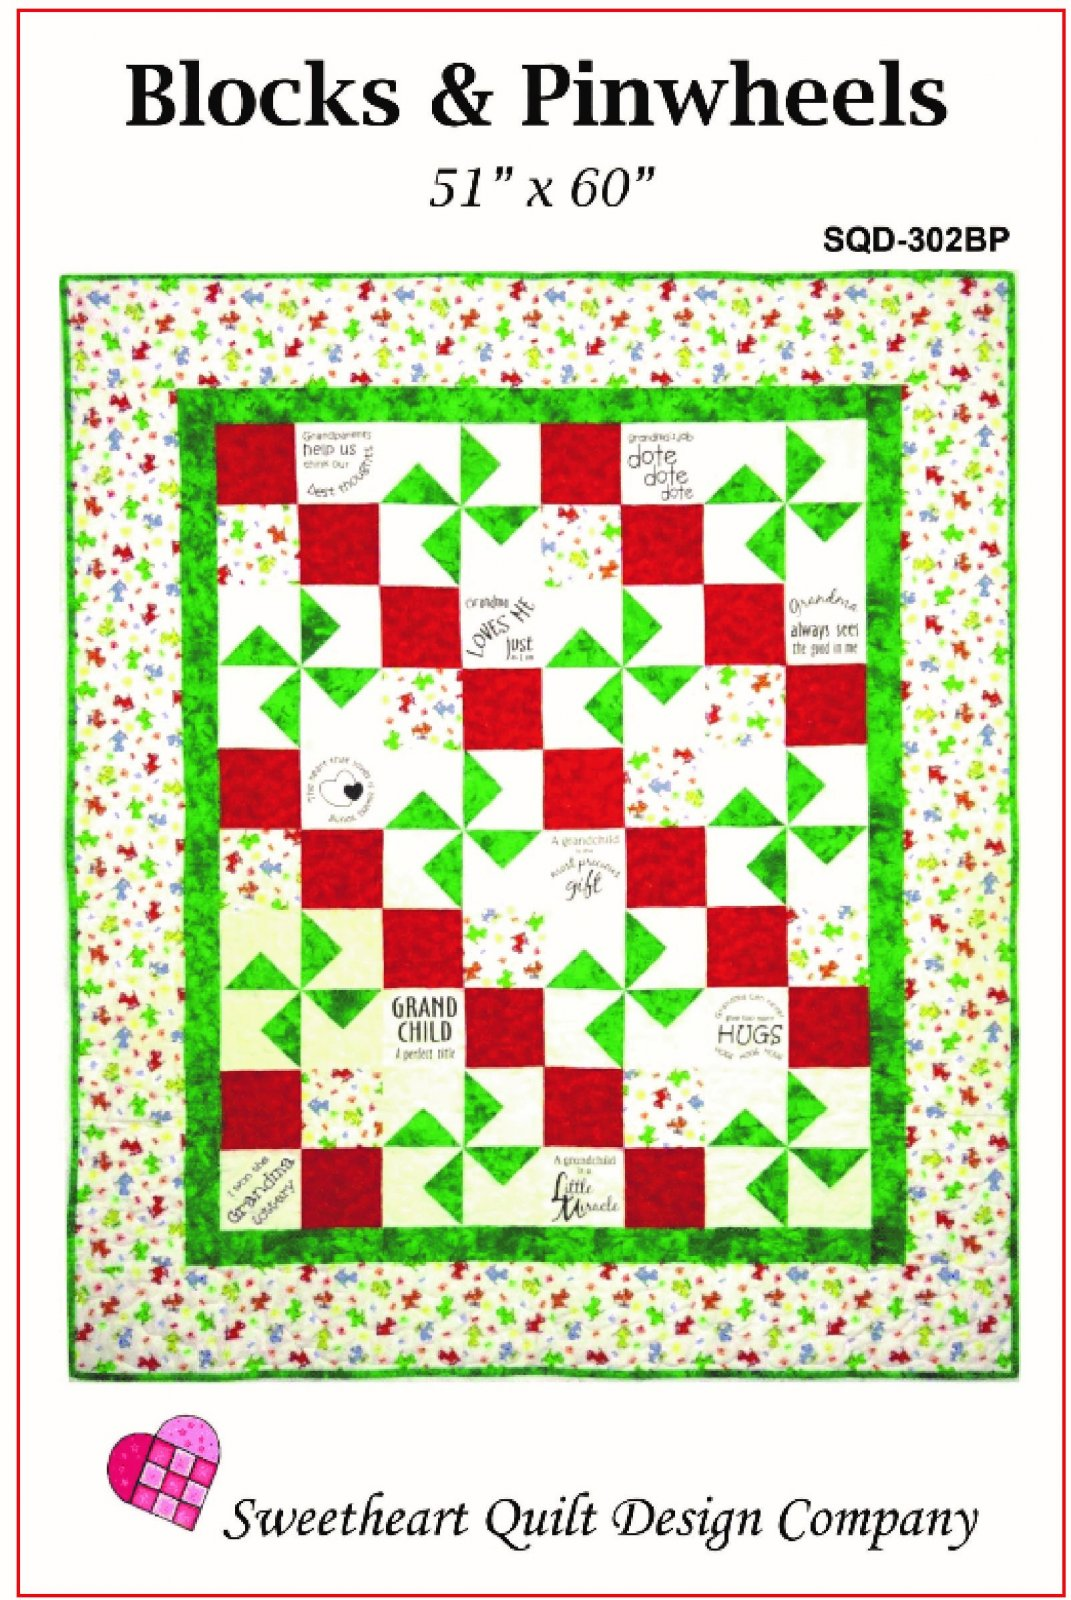 Blocks and Pinwheels Pattern and Panel